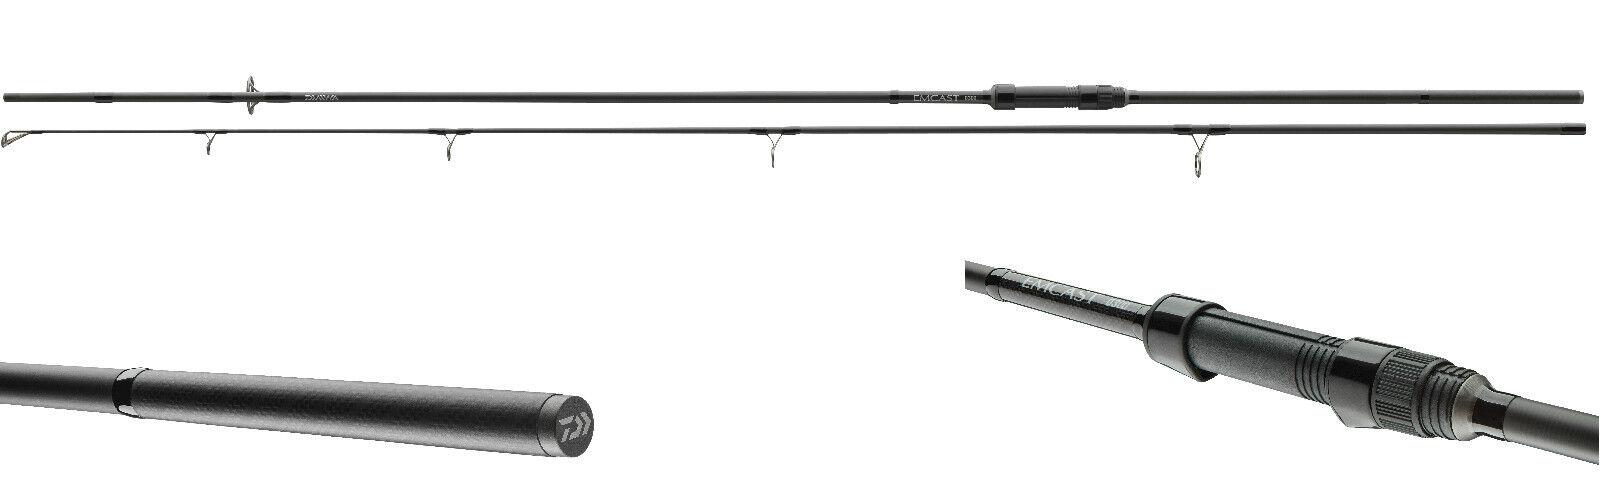 Daiwa Emcast Carp 3,60m 3,0 lbs Karpfenrute 2-teilig Karpfenangel 50er Startring